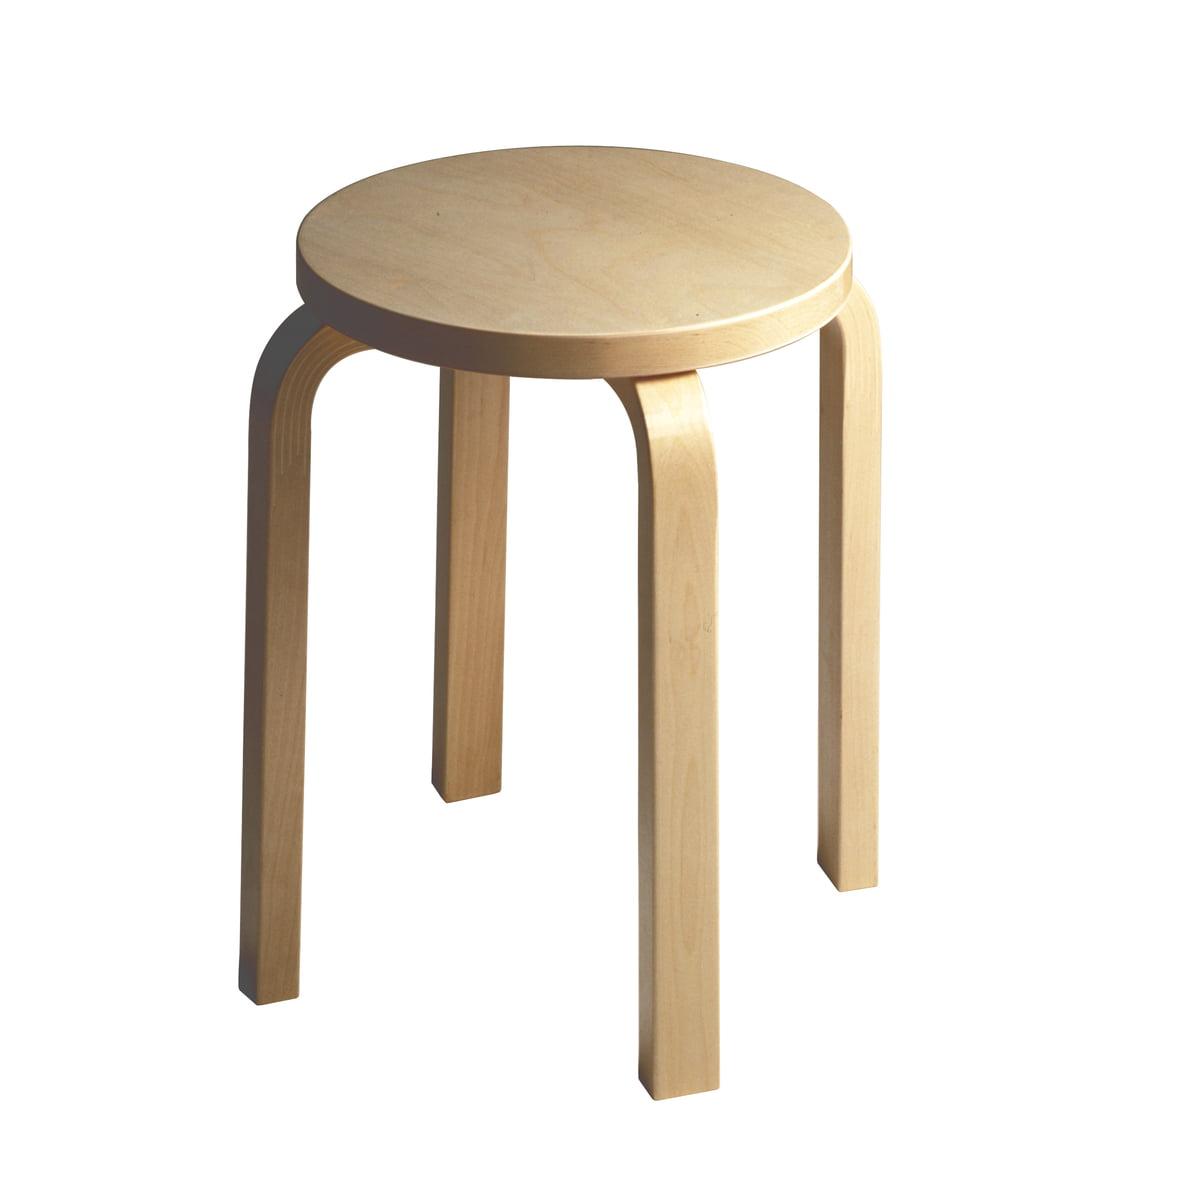 stool e  artek  shop - artek stool e birch